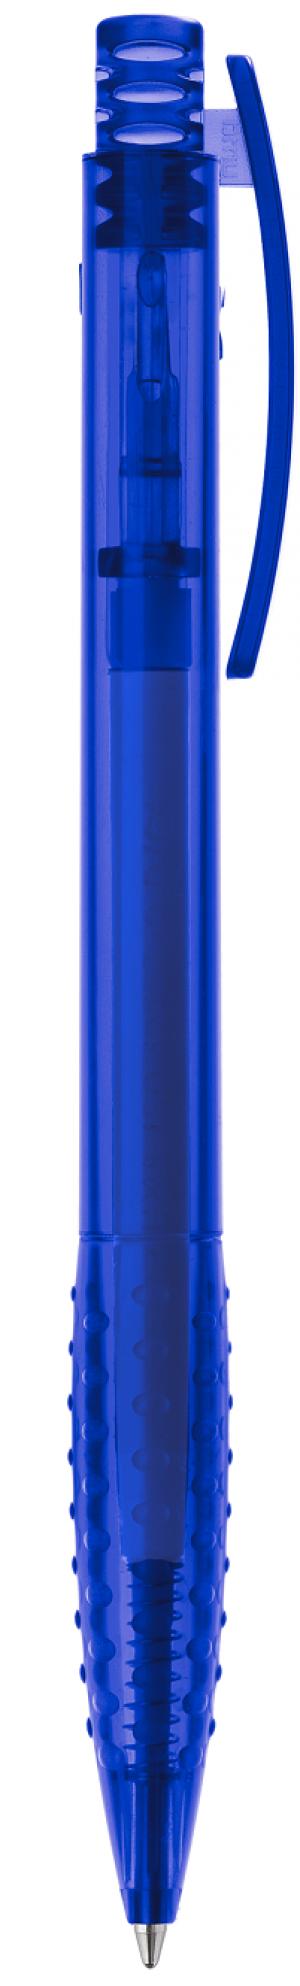 Шариковая ручка b 0-0003 T X-TASY transparent